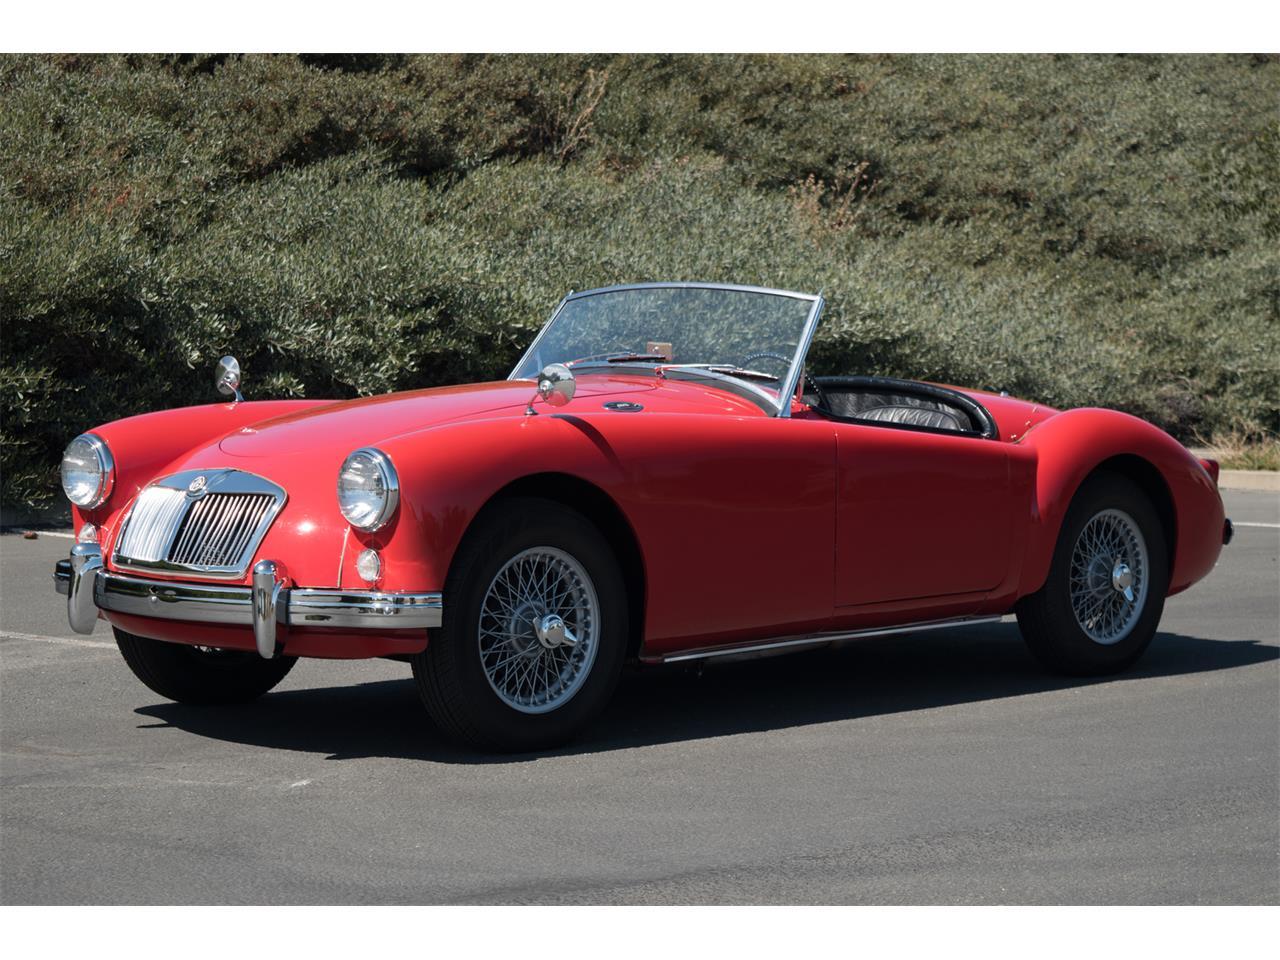 1957 MG MGA (CC-1248531) for sale in Fairfield, California